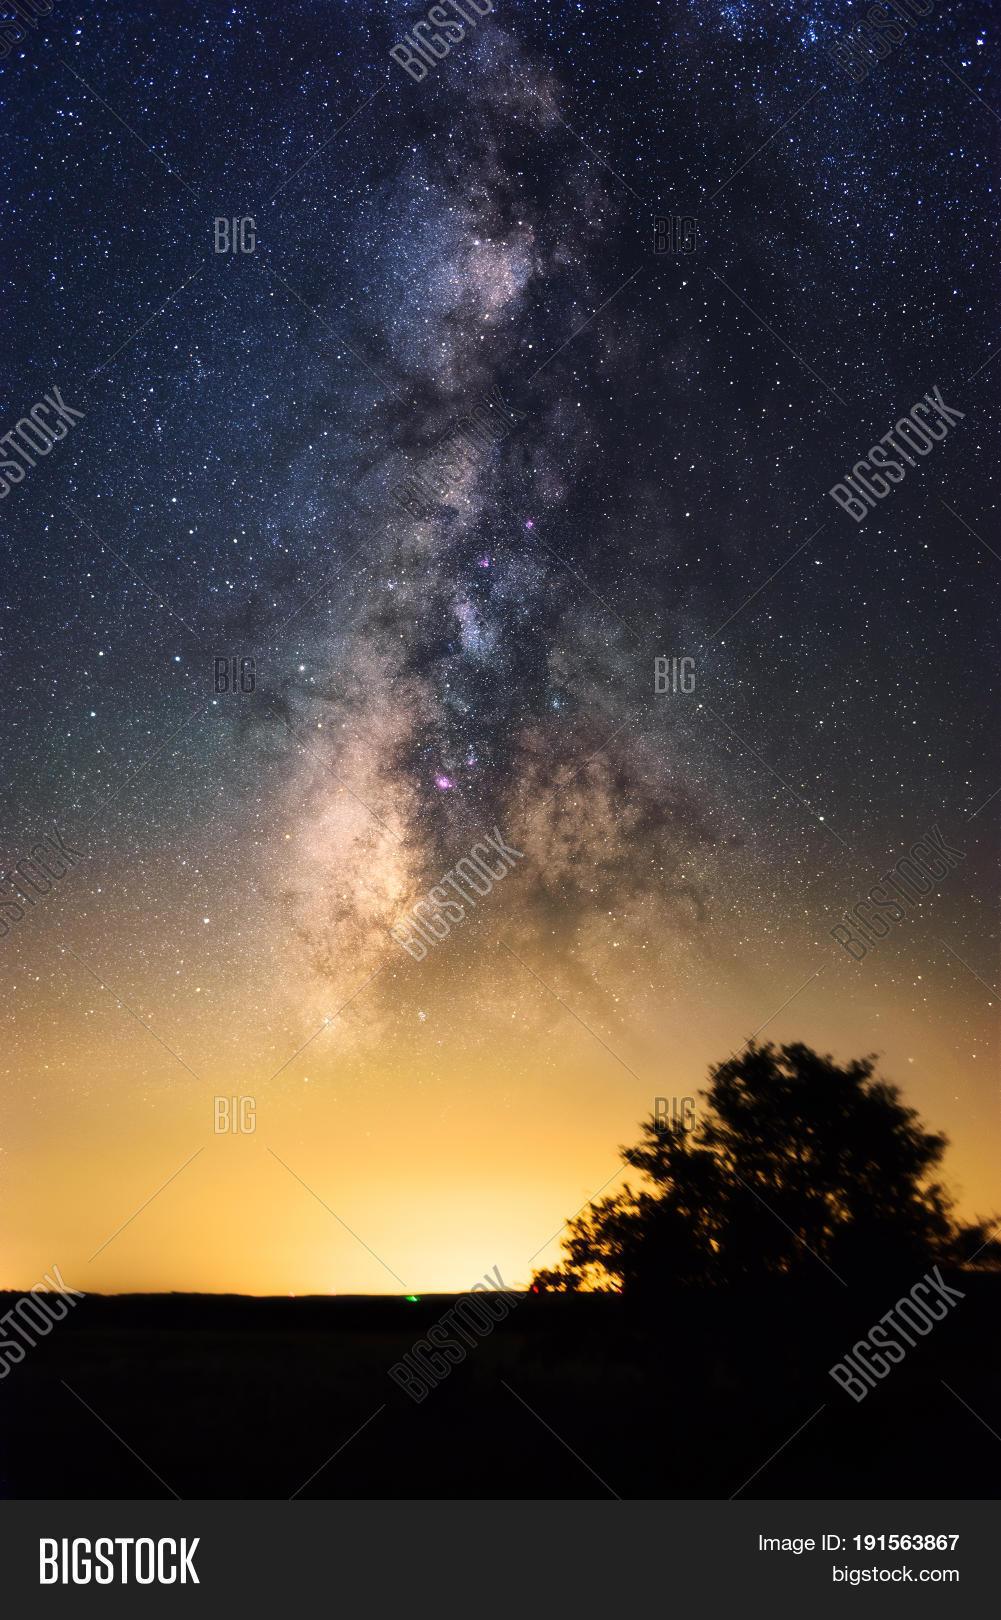 Milky Way Close Yellow Image & Photo (Free Trial) | Bigstock